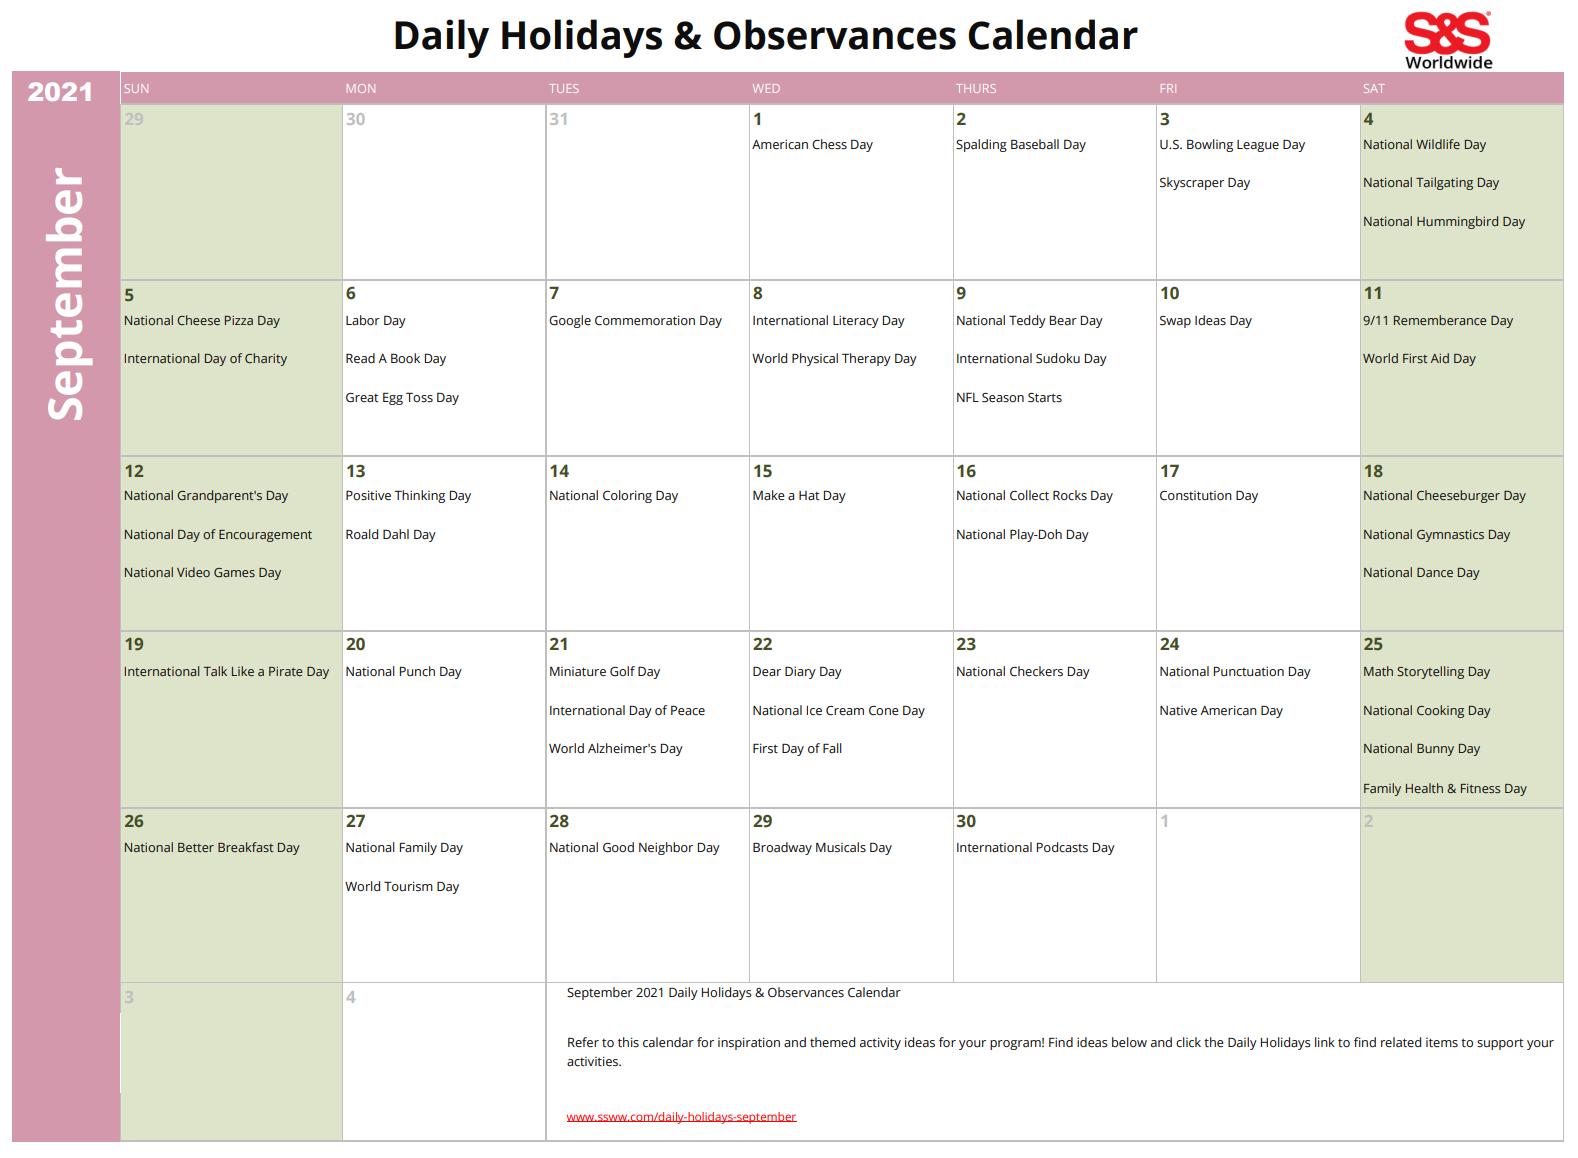 September 2021 Printable Daily Holiday Calendar